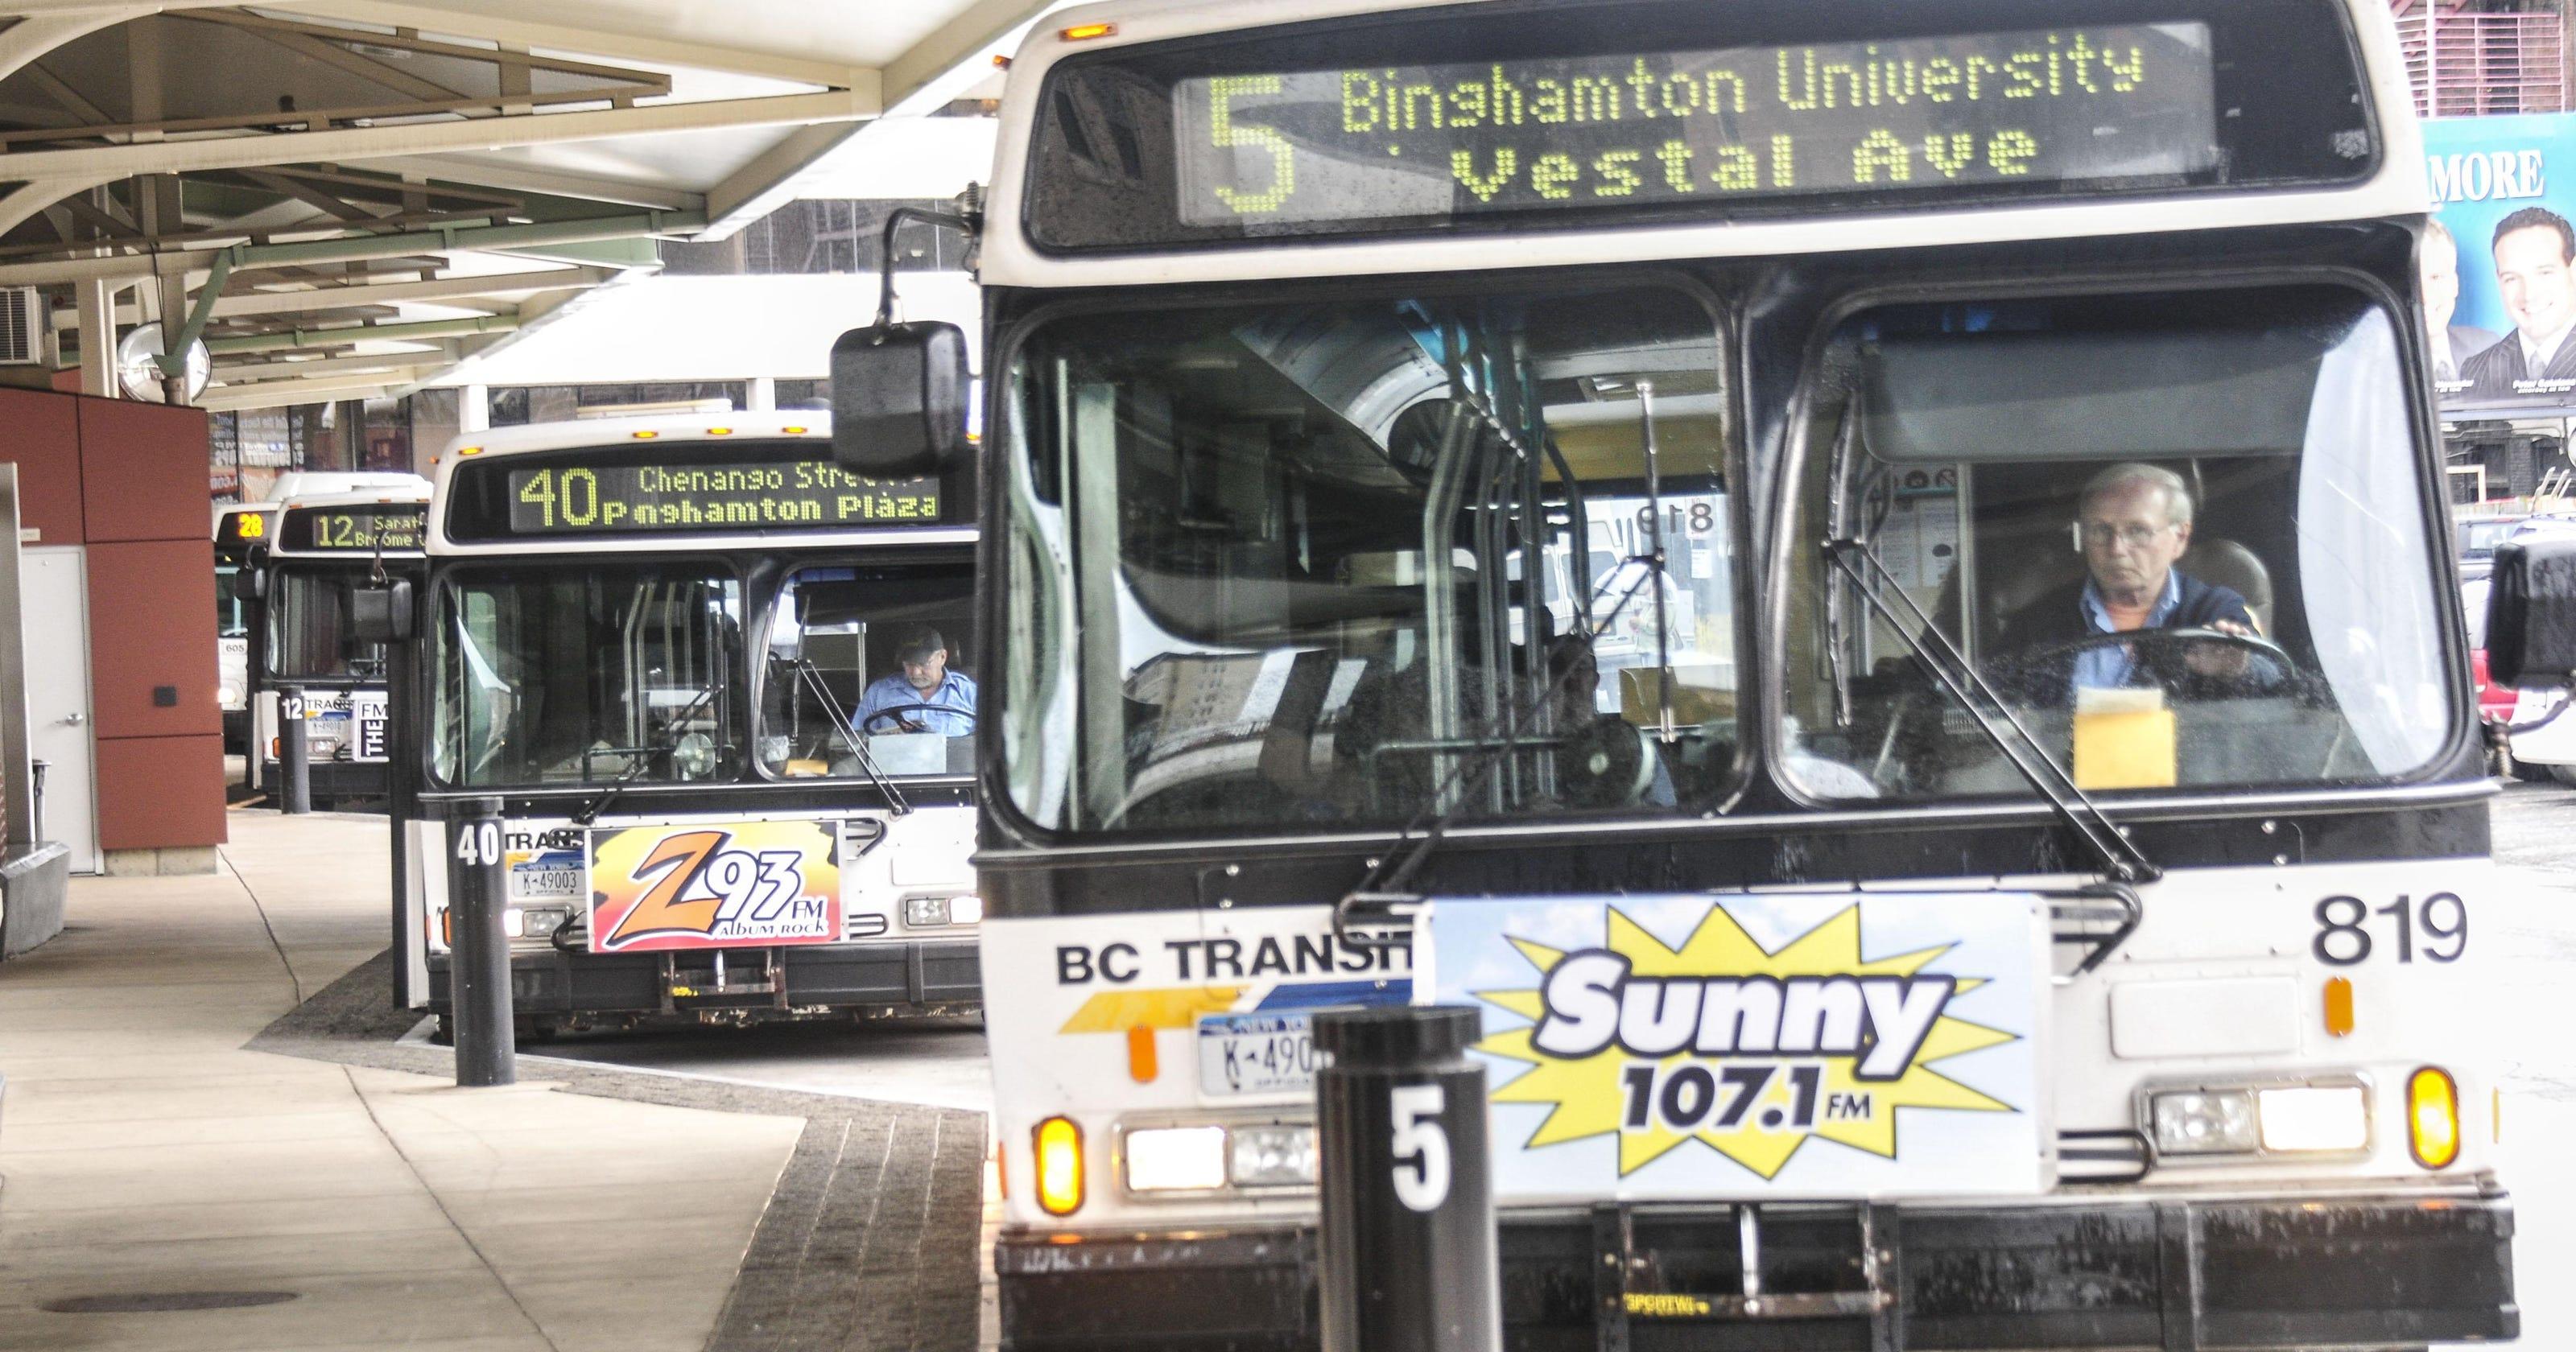 new bus schedule causes headaches